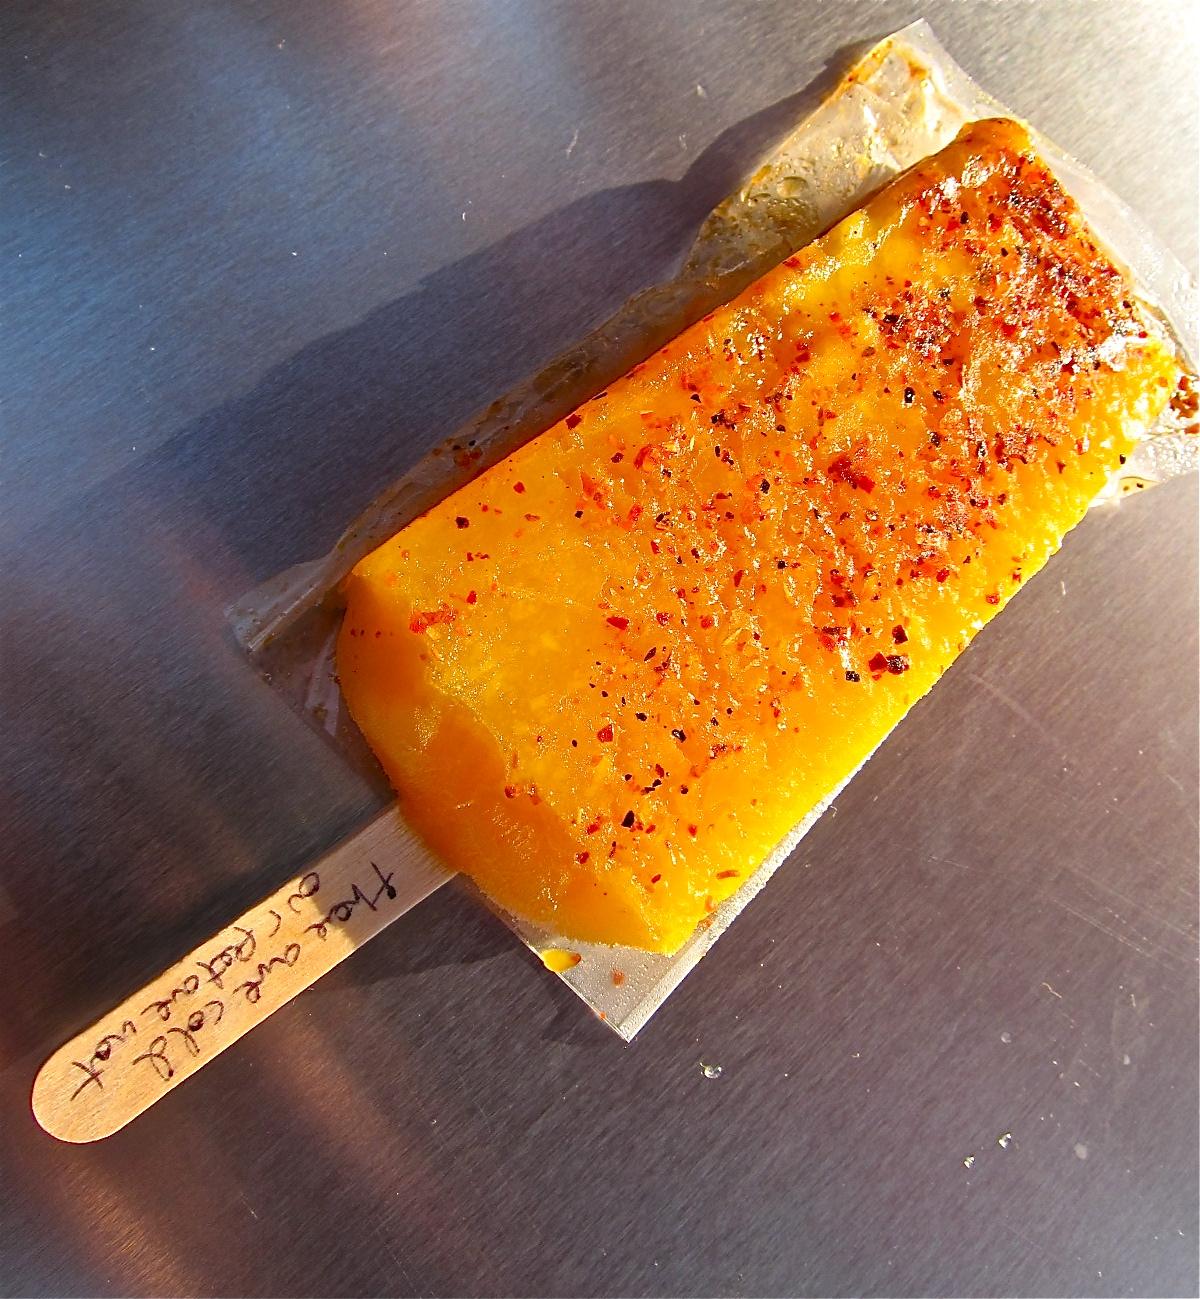 The mango-chile paleta bursts with bright, juicy mango chunks. Spicy ...